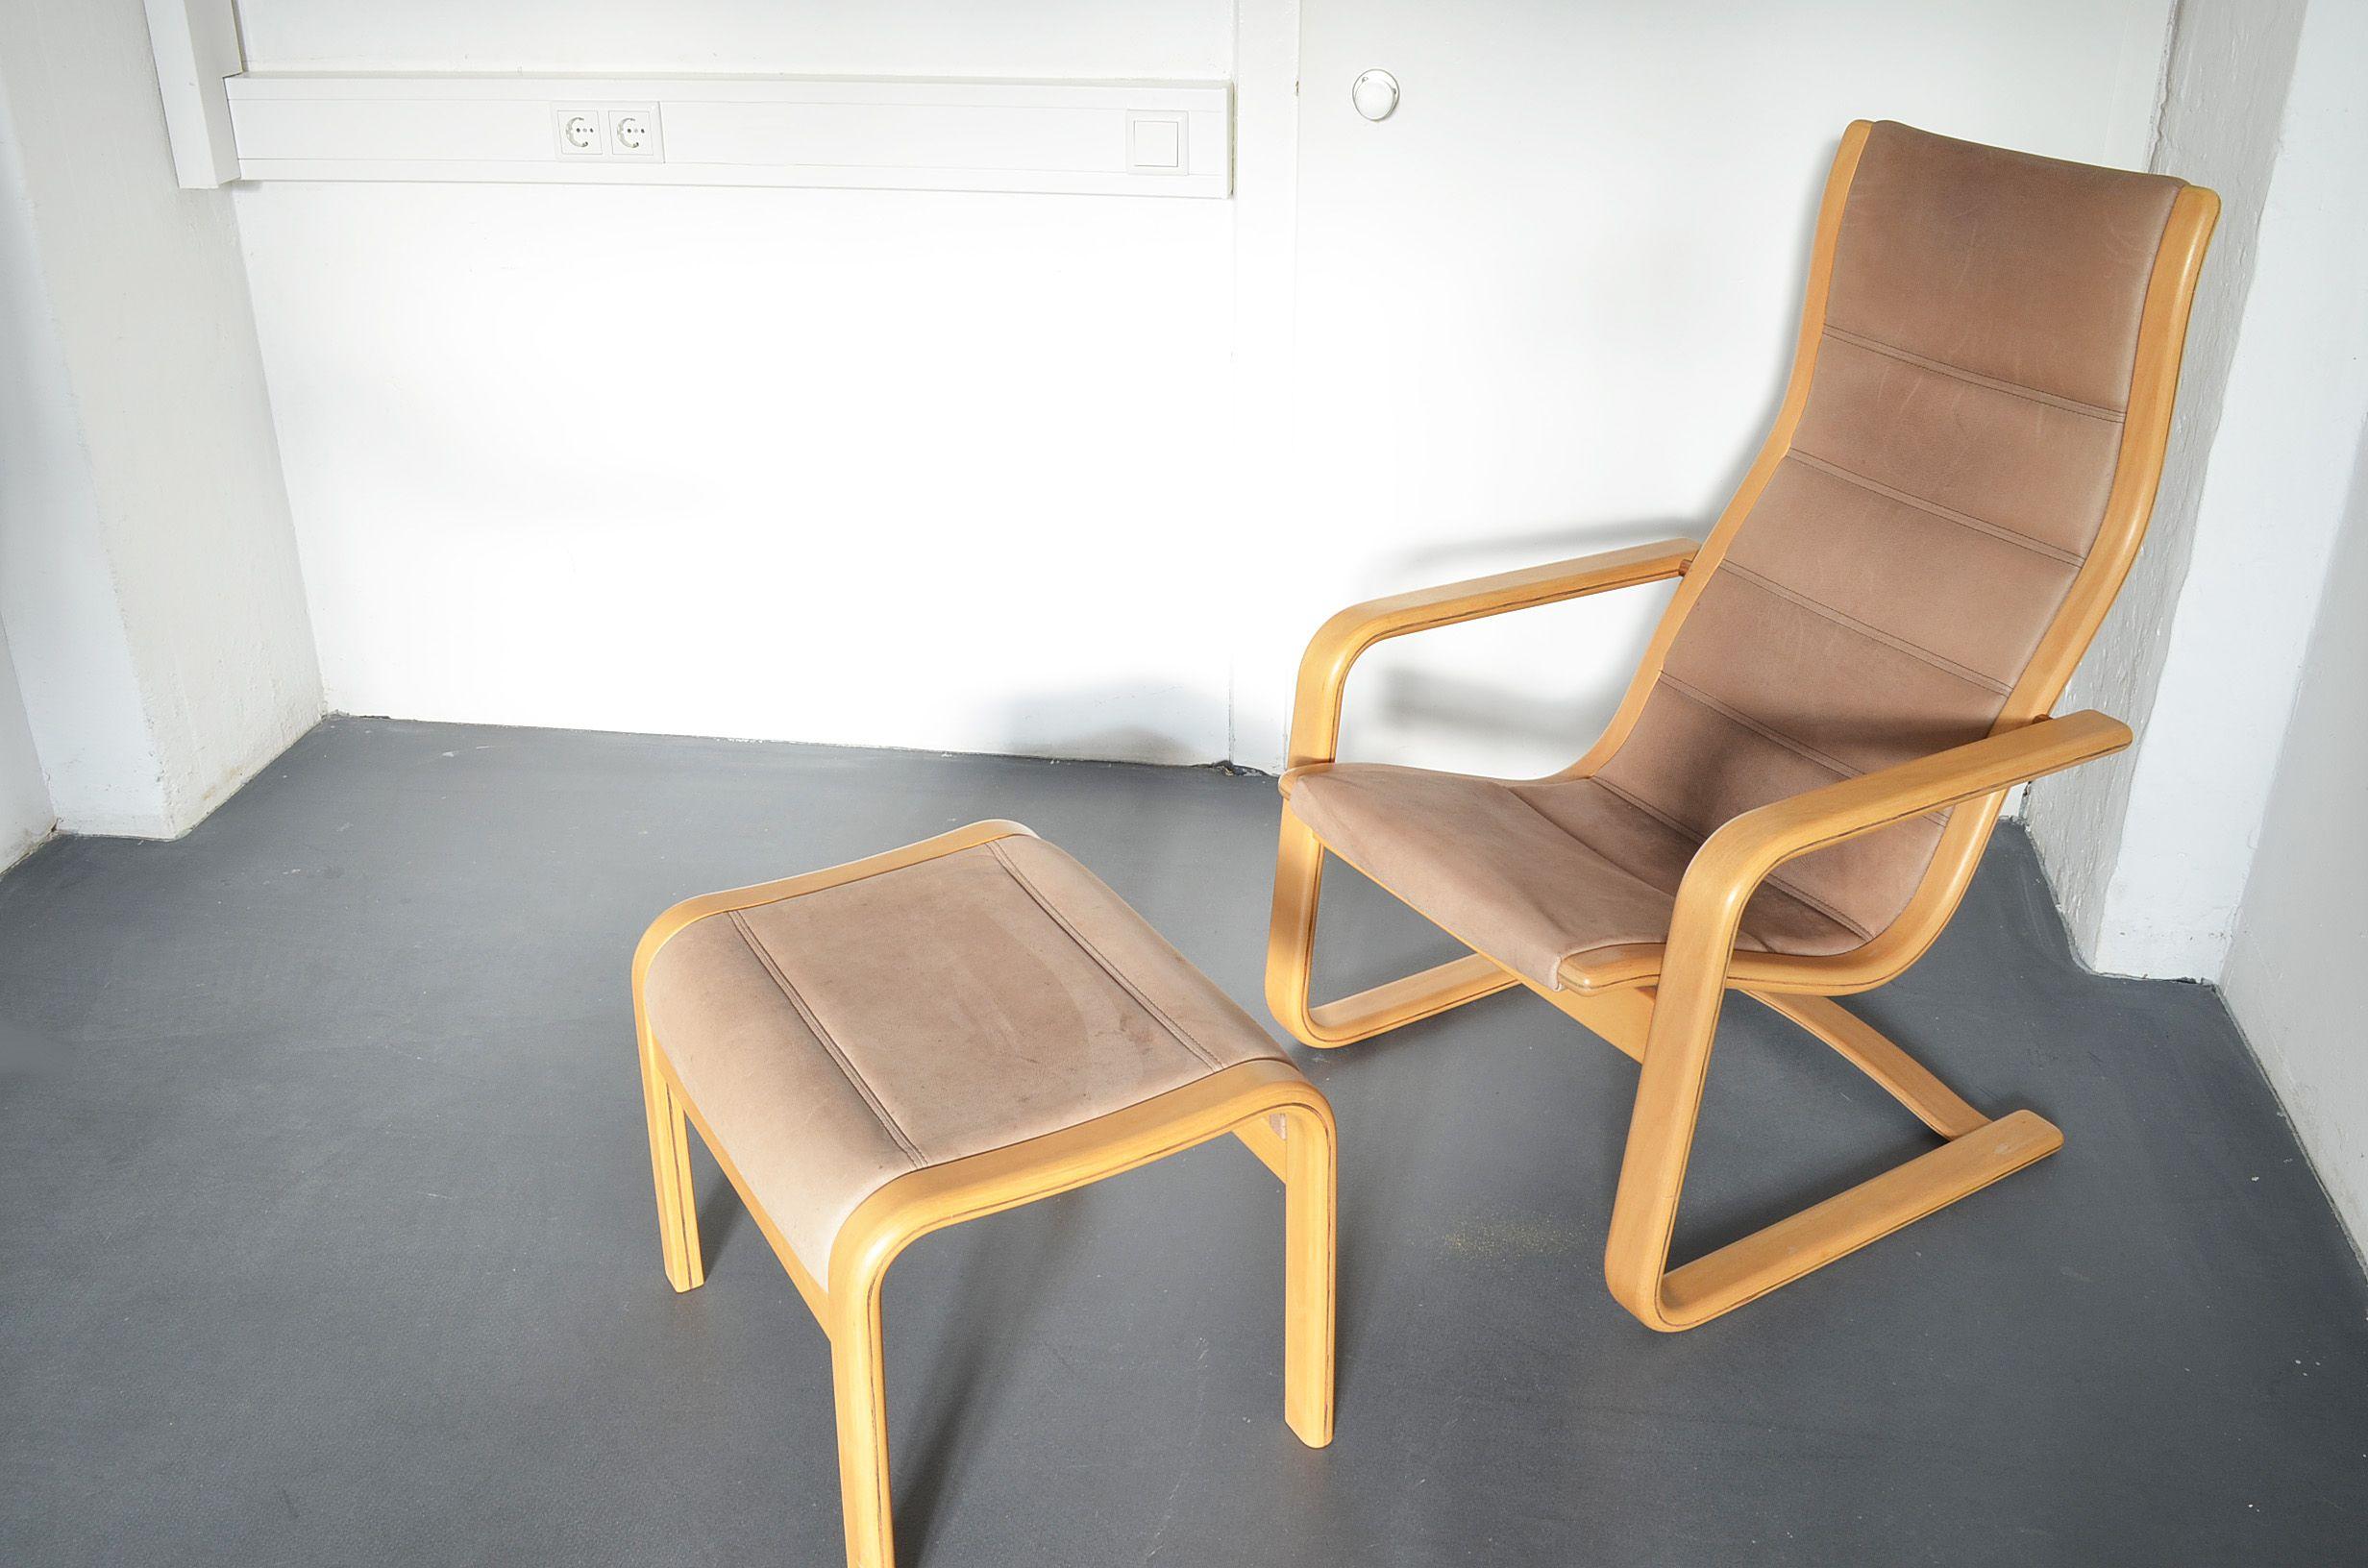 Armlehnstuhl #lounge chair #lamello mit hocker #ottoman